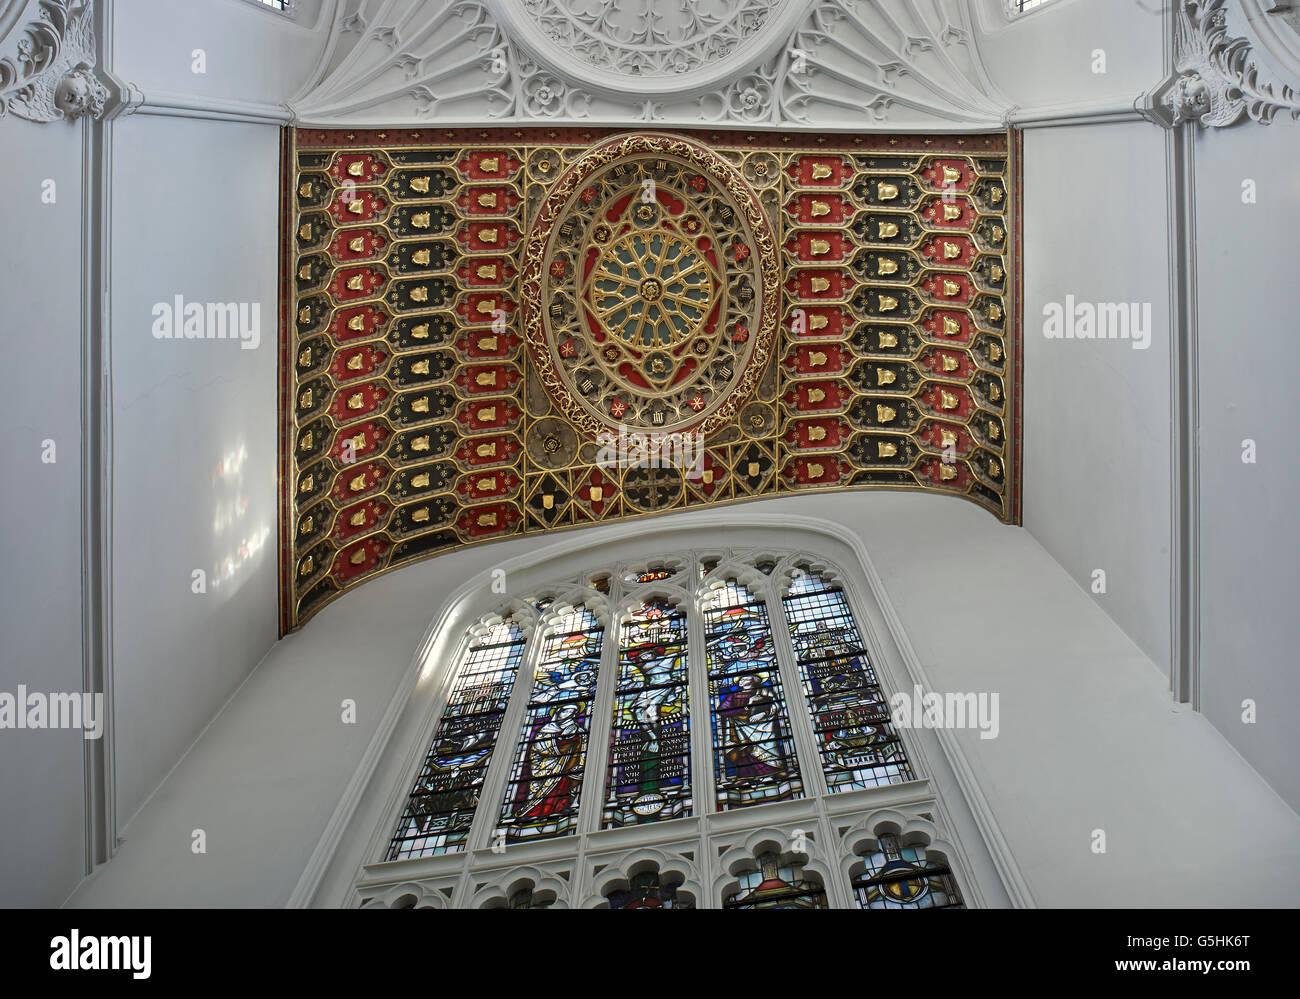 St Mary Aldermary, Kirche in der City of London, gotischen Chor Decke Stockbild